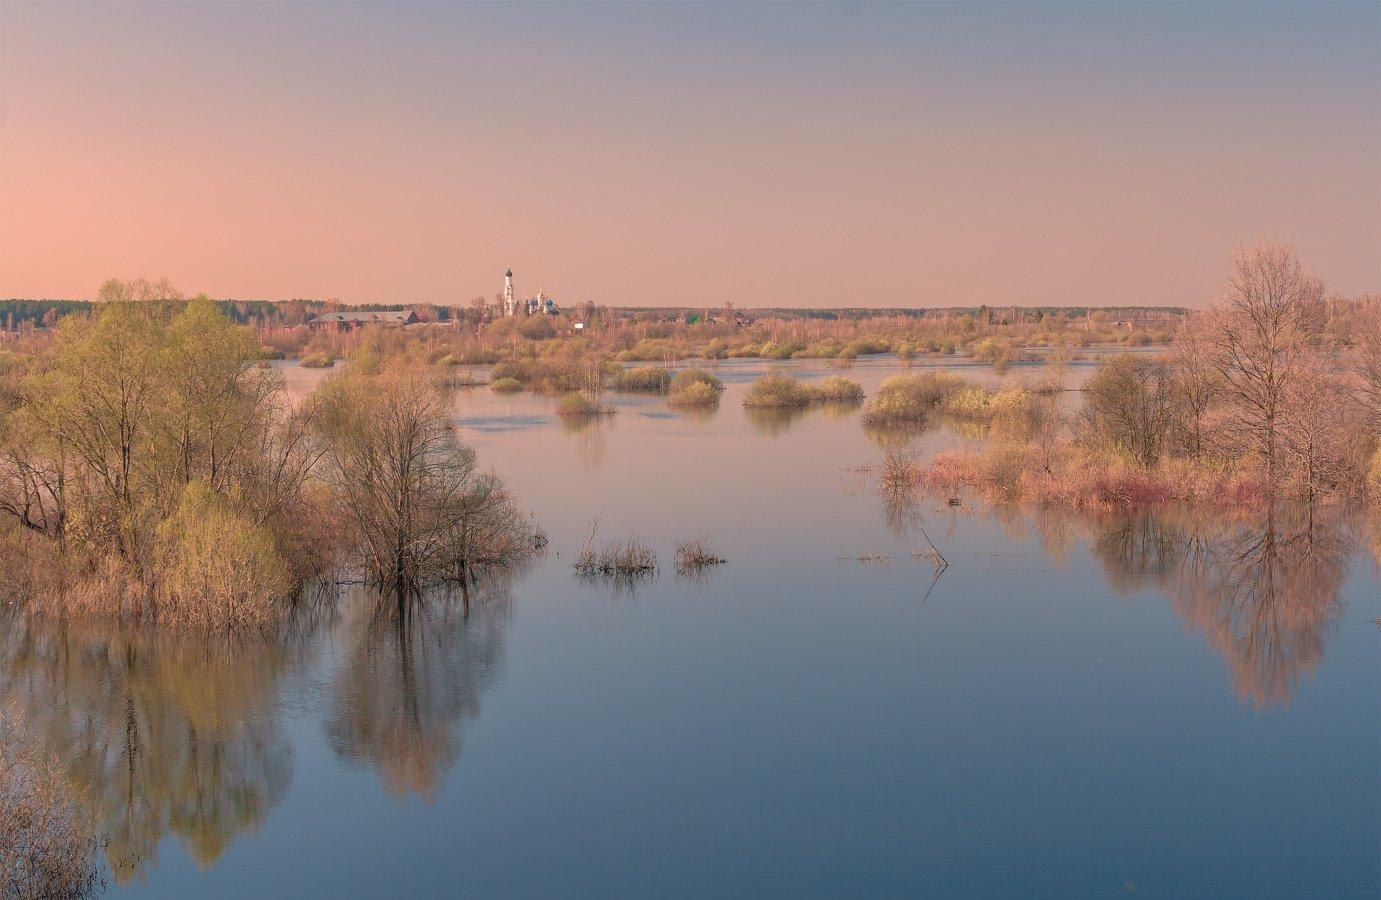 весна, вечер, река, разлив, Виктор Климкин